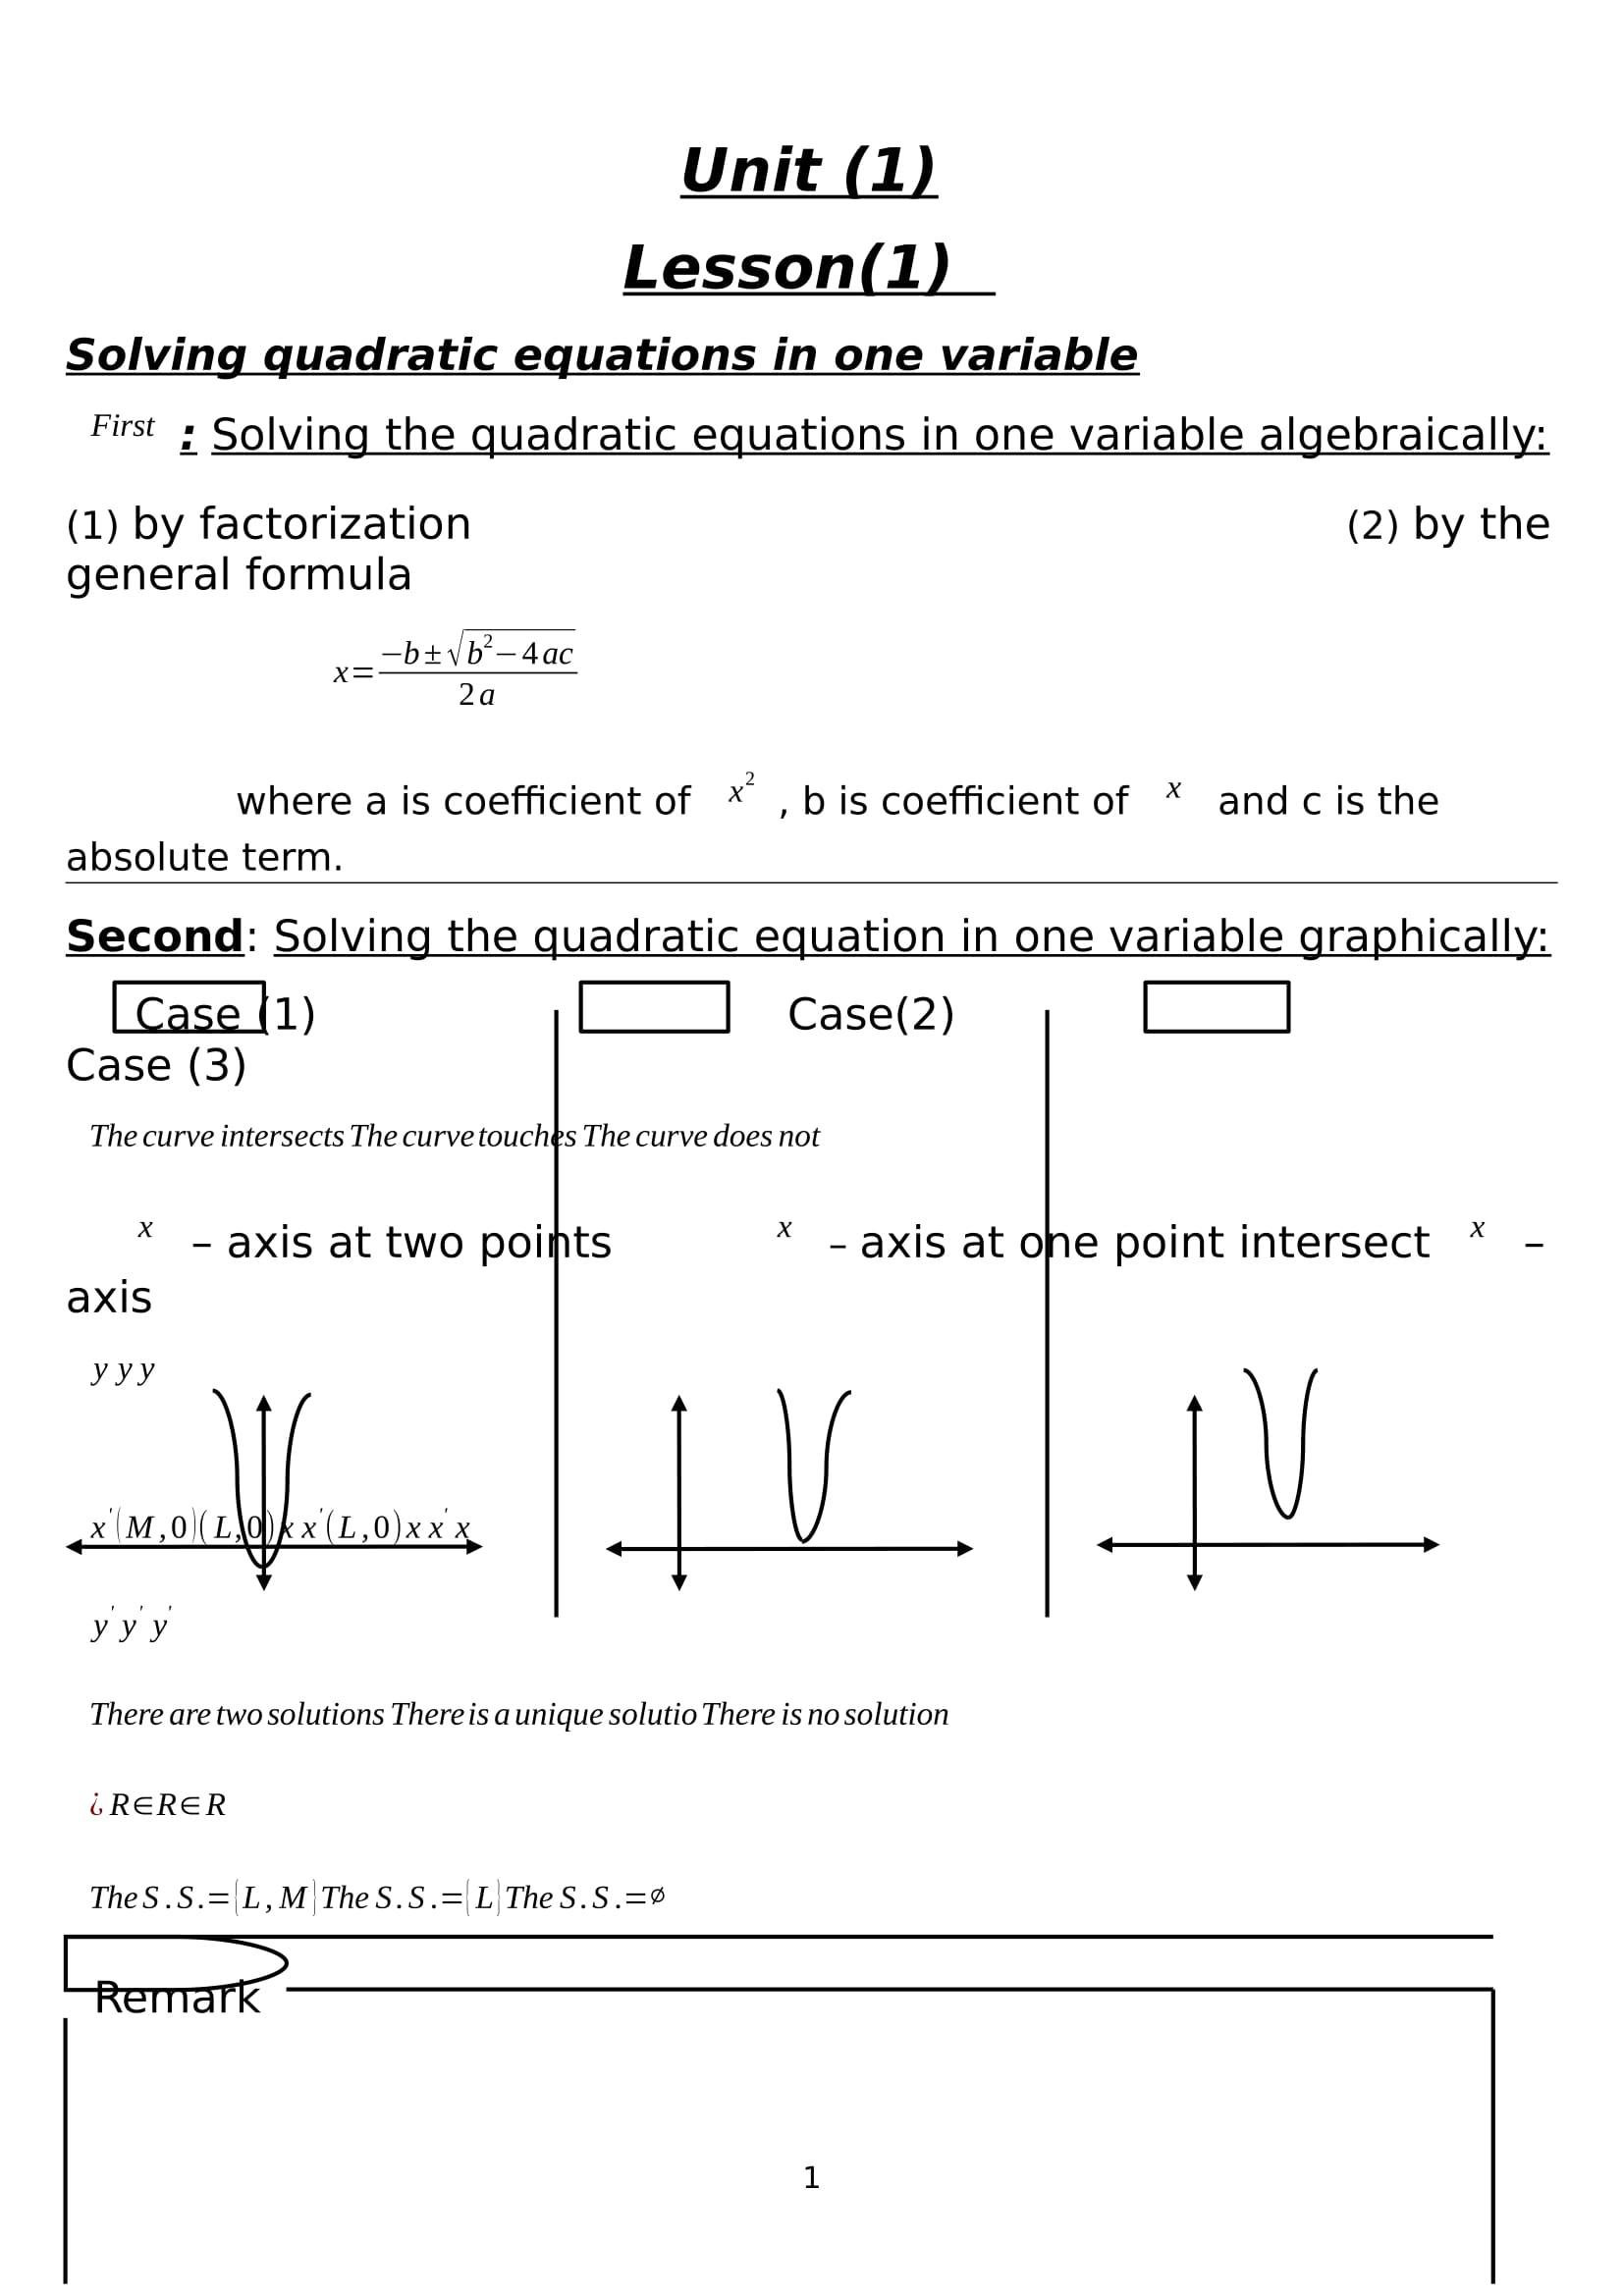 exam-eg.com_1511271652521.jpg